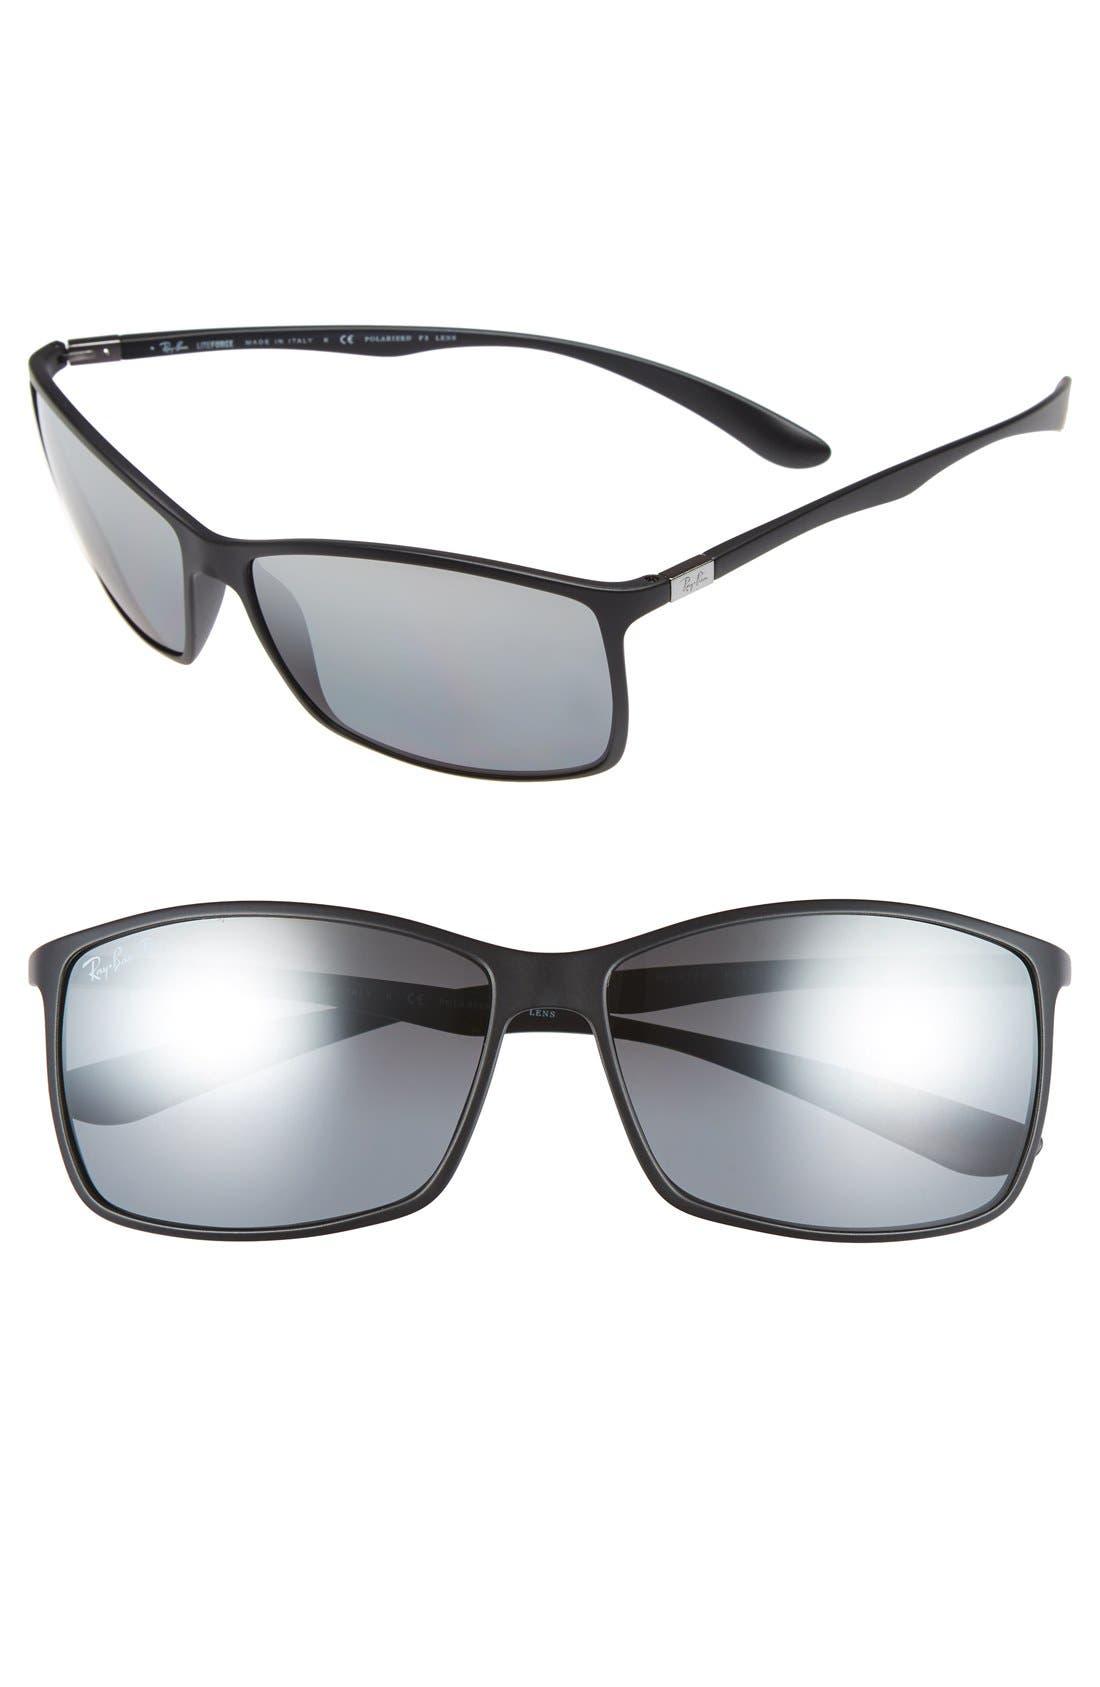 Main Image - Ray-Ban 'TECH Liteforce' 62mm Polarized Sunglasses